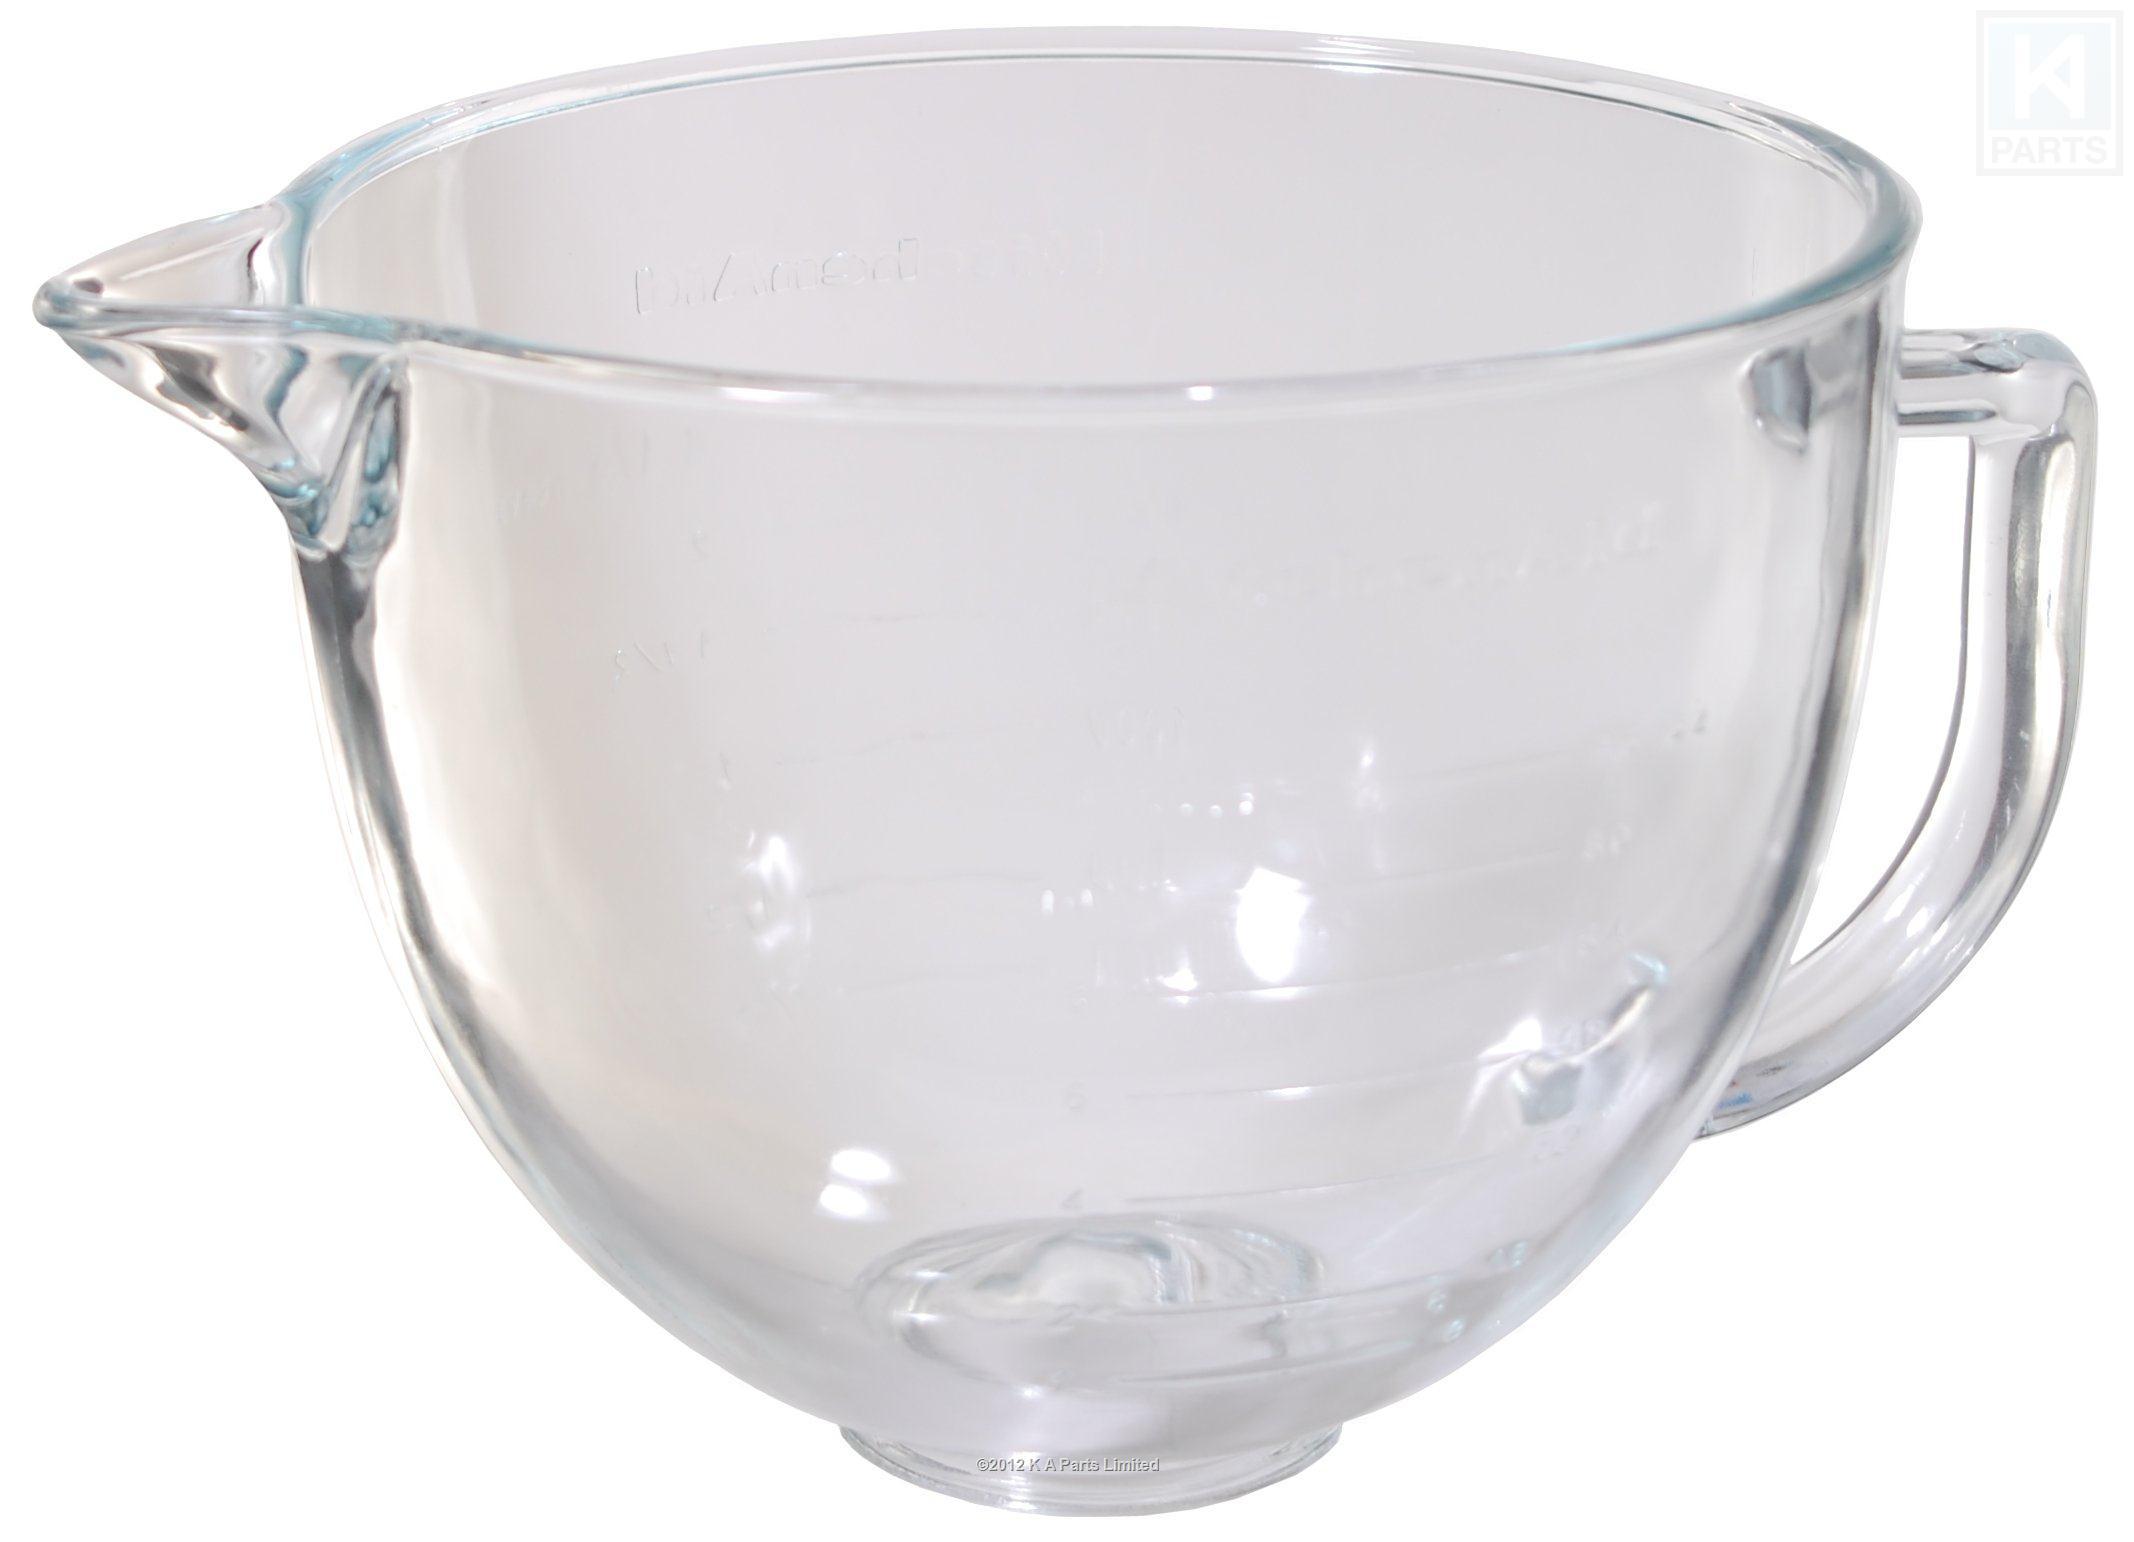 Kitchenaid Mixer 5 Qt Glass Bowl Also Known As K5gb Ebay